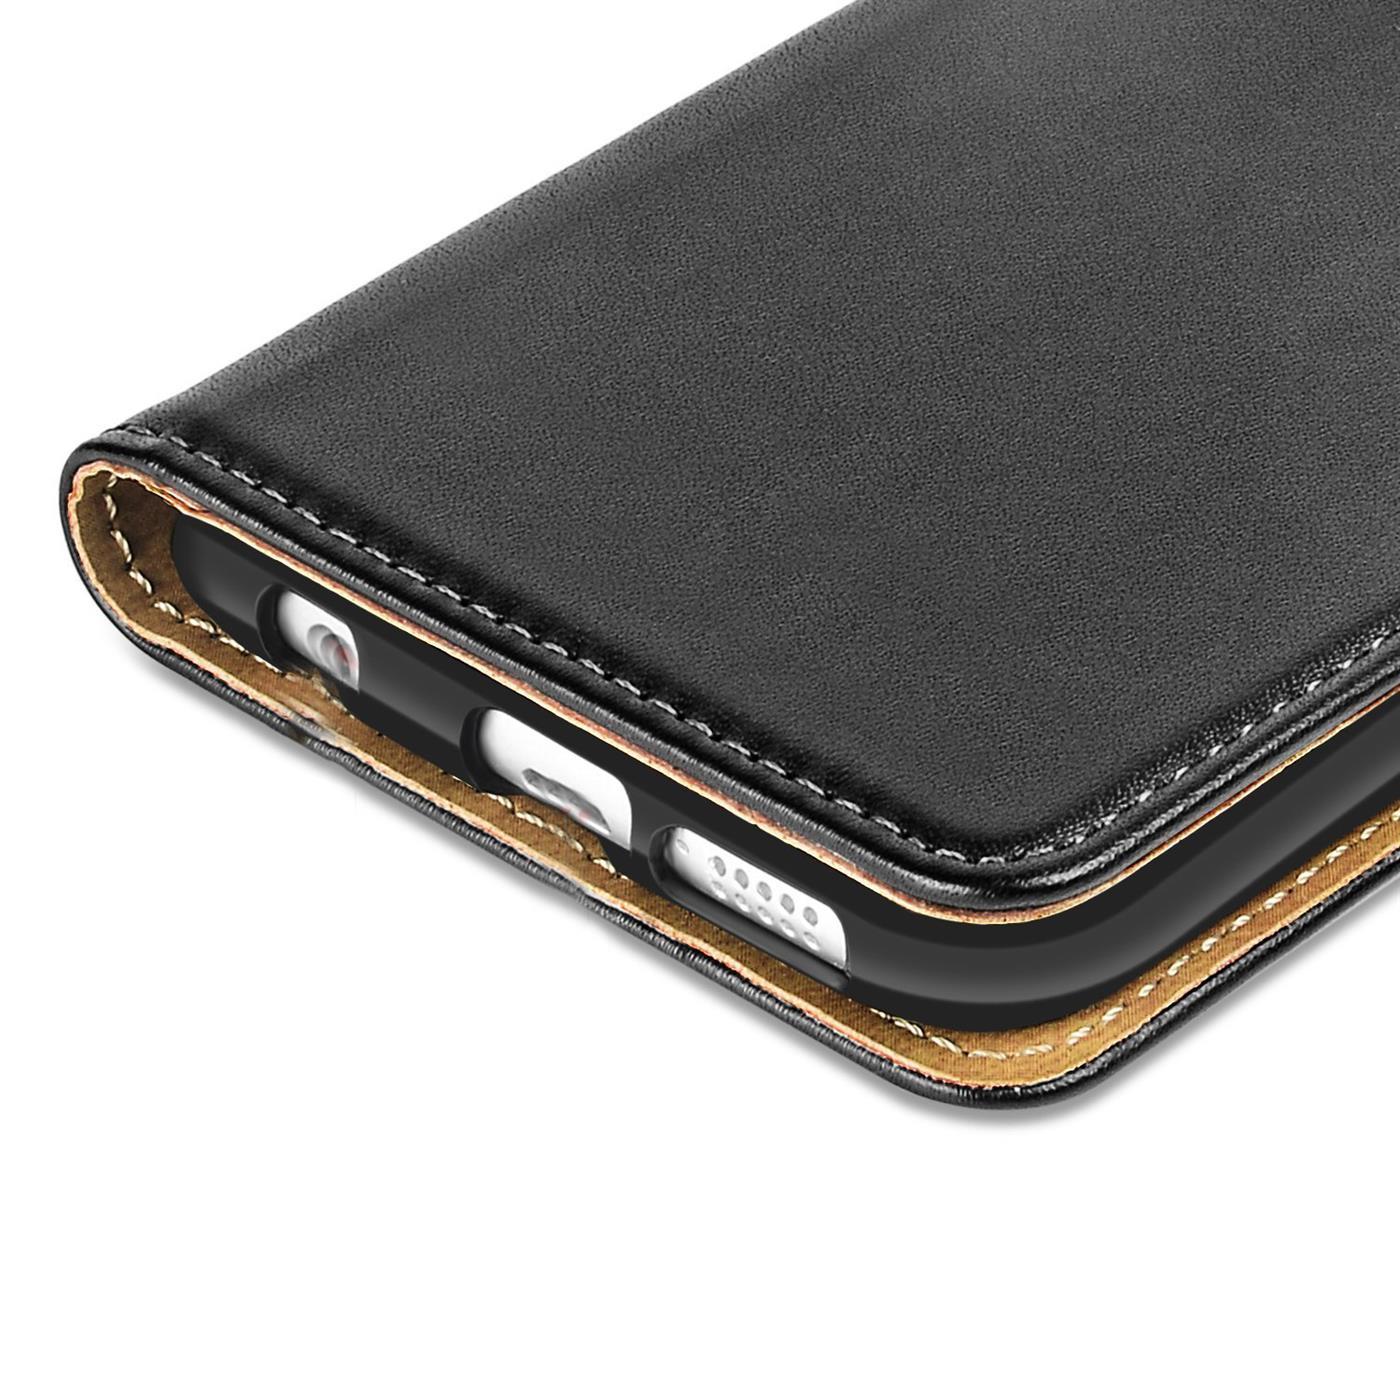 Book-Case-Samsung-Galaxy-s6-edge-Plus-Sac-etui-Flip-Cover-pour-Telephone-Portable-etui-Noir miniature 5